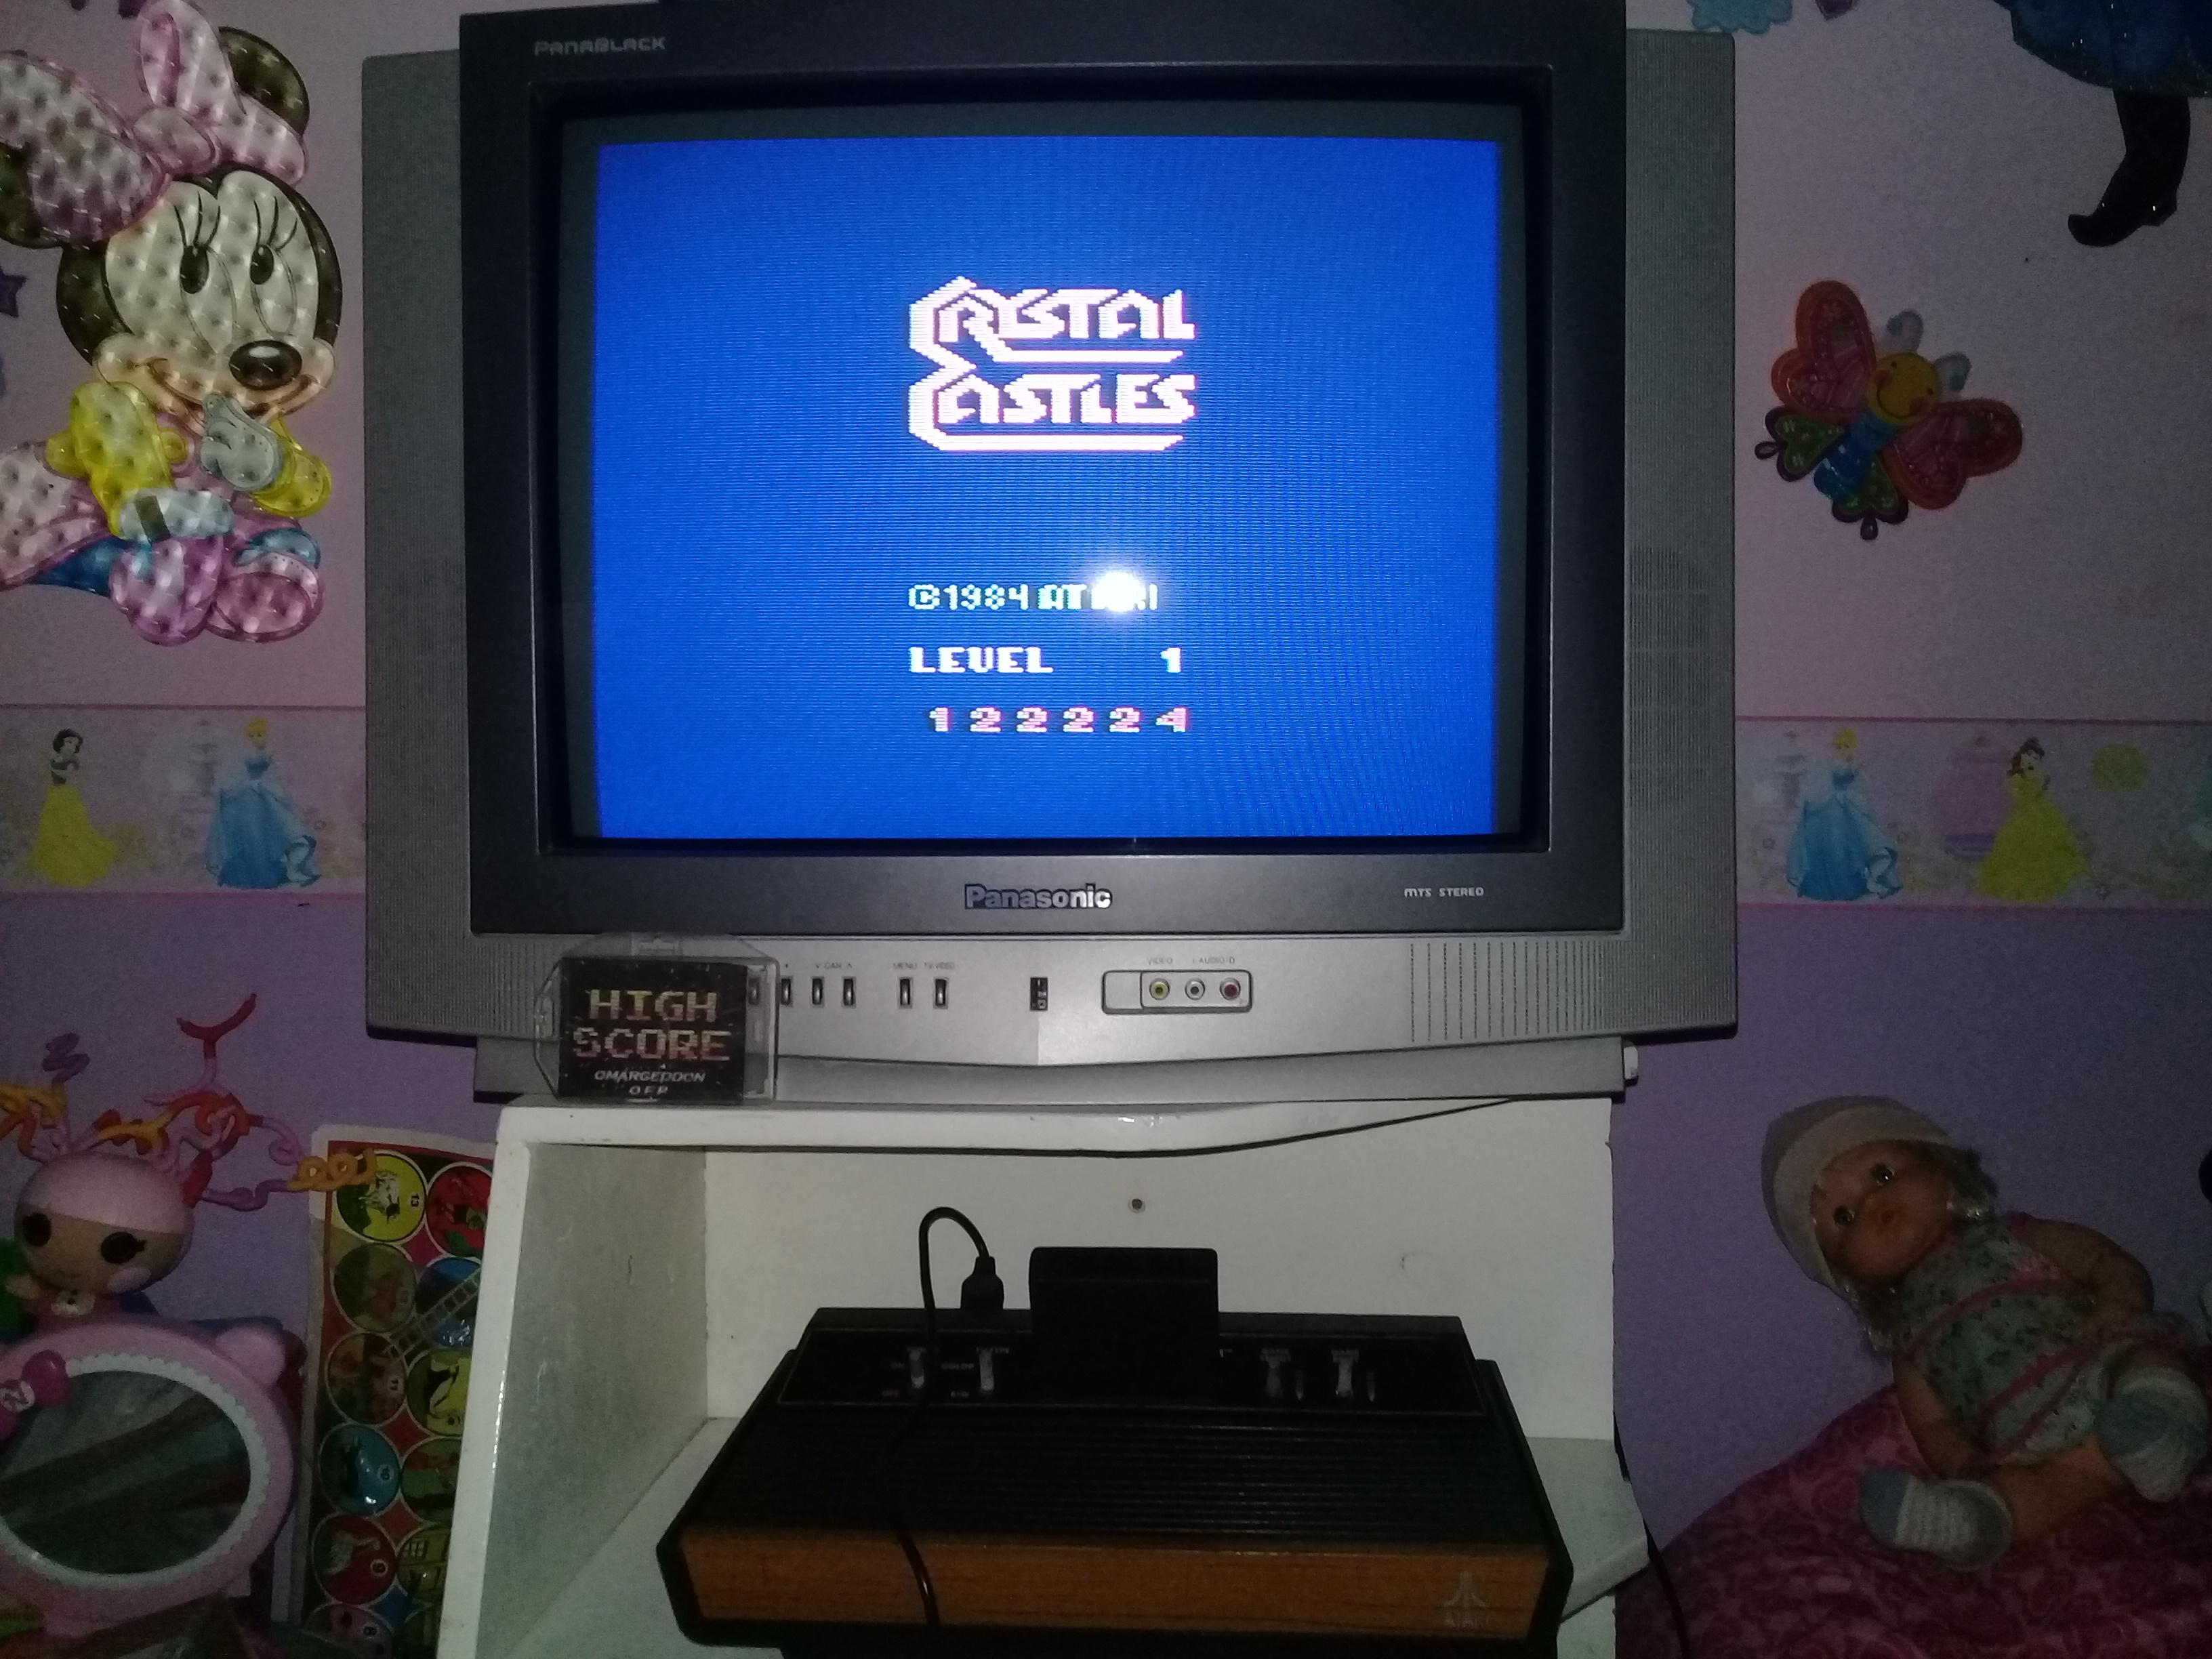 omargeddon: Crystal Castles (Atari 2600 Expert/A) 122,224 points on 2019-06-23 18:23:47